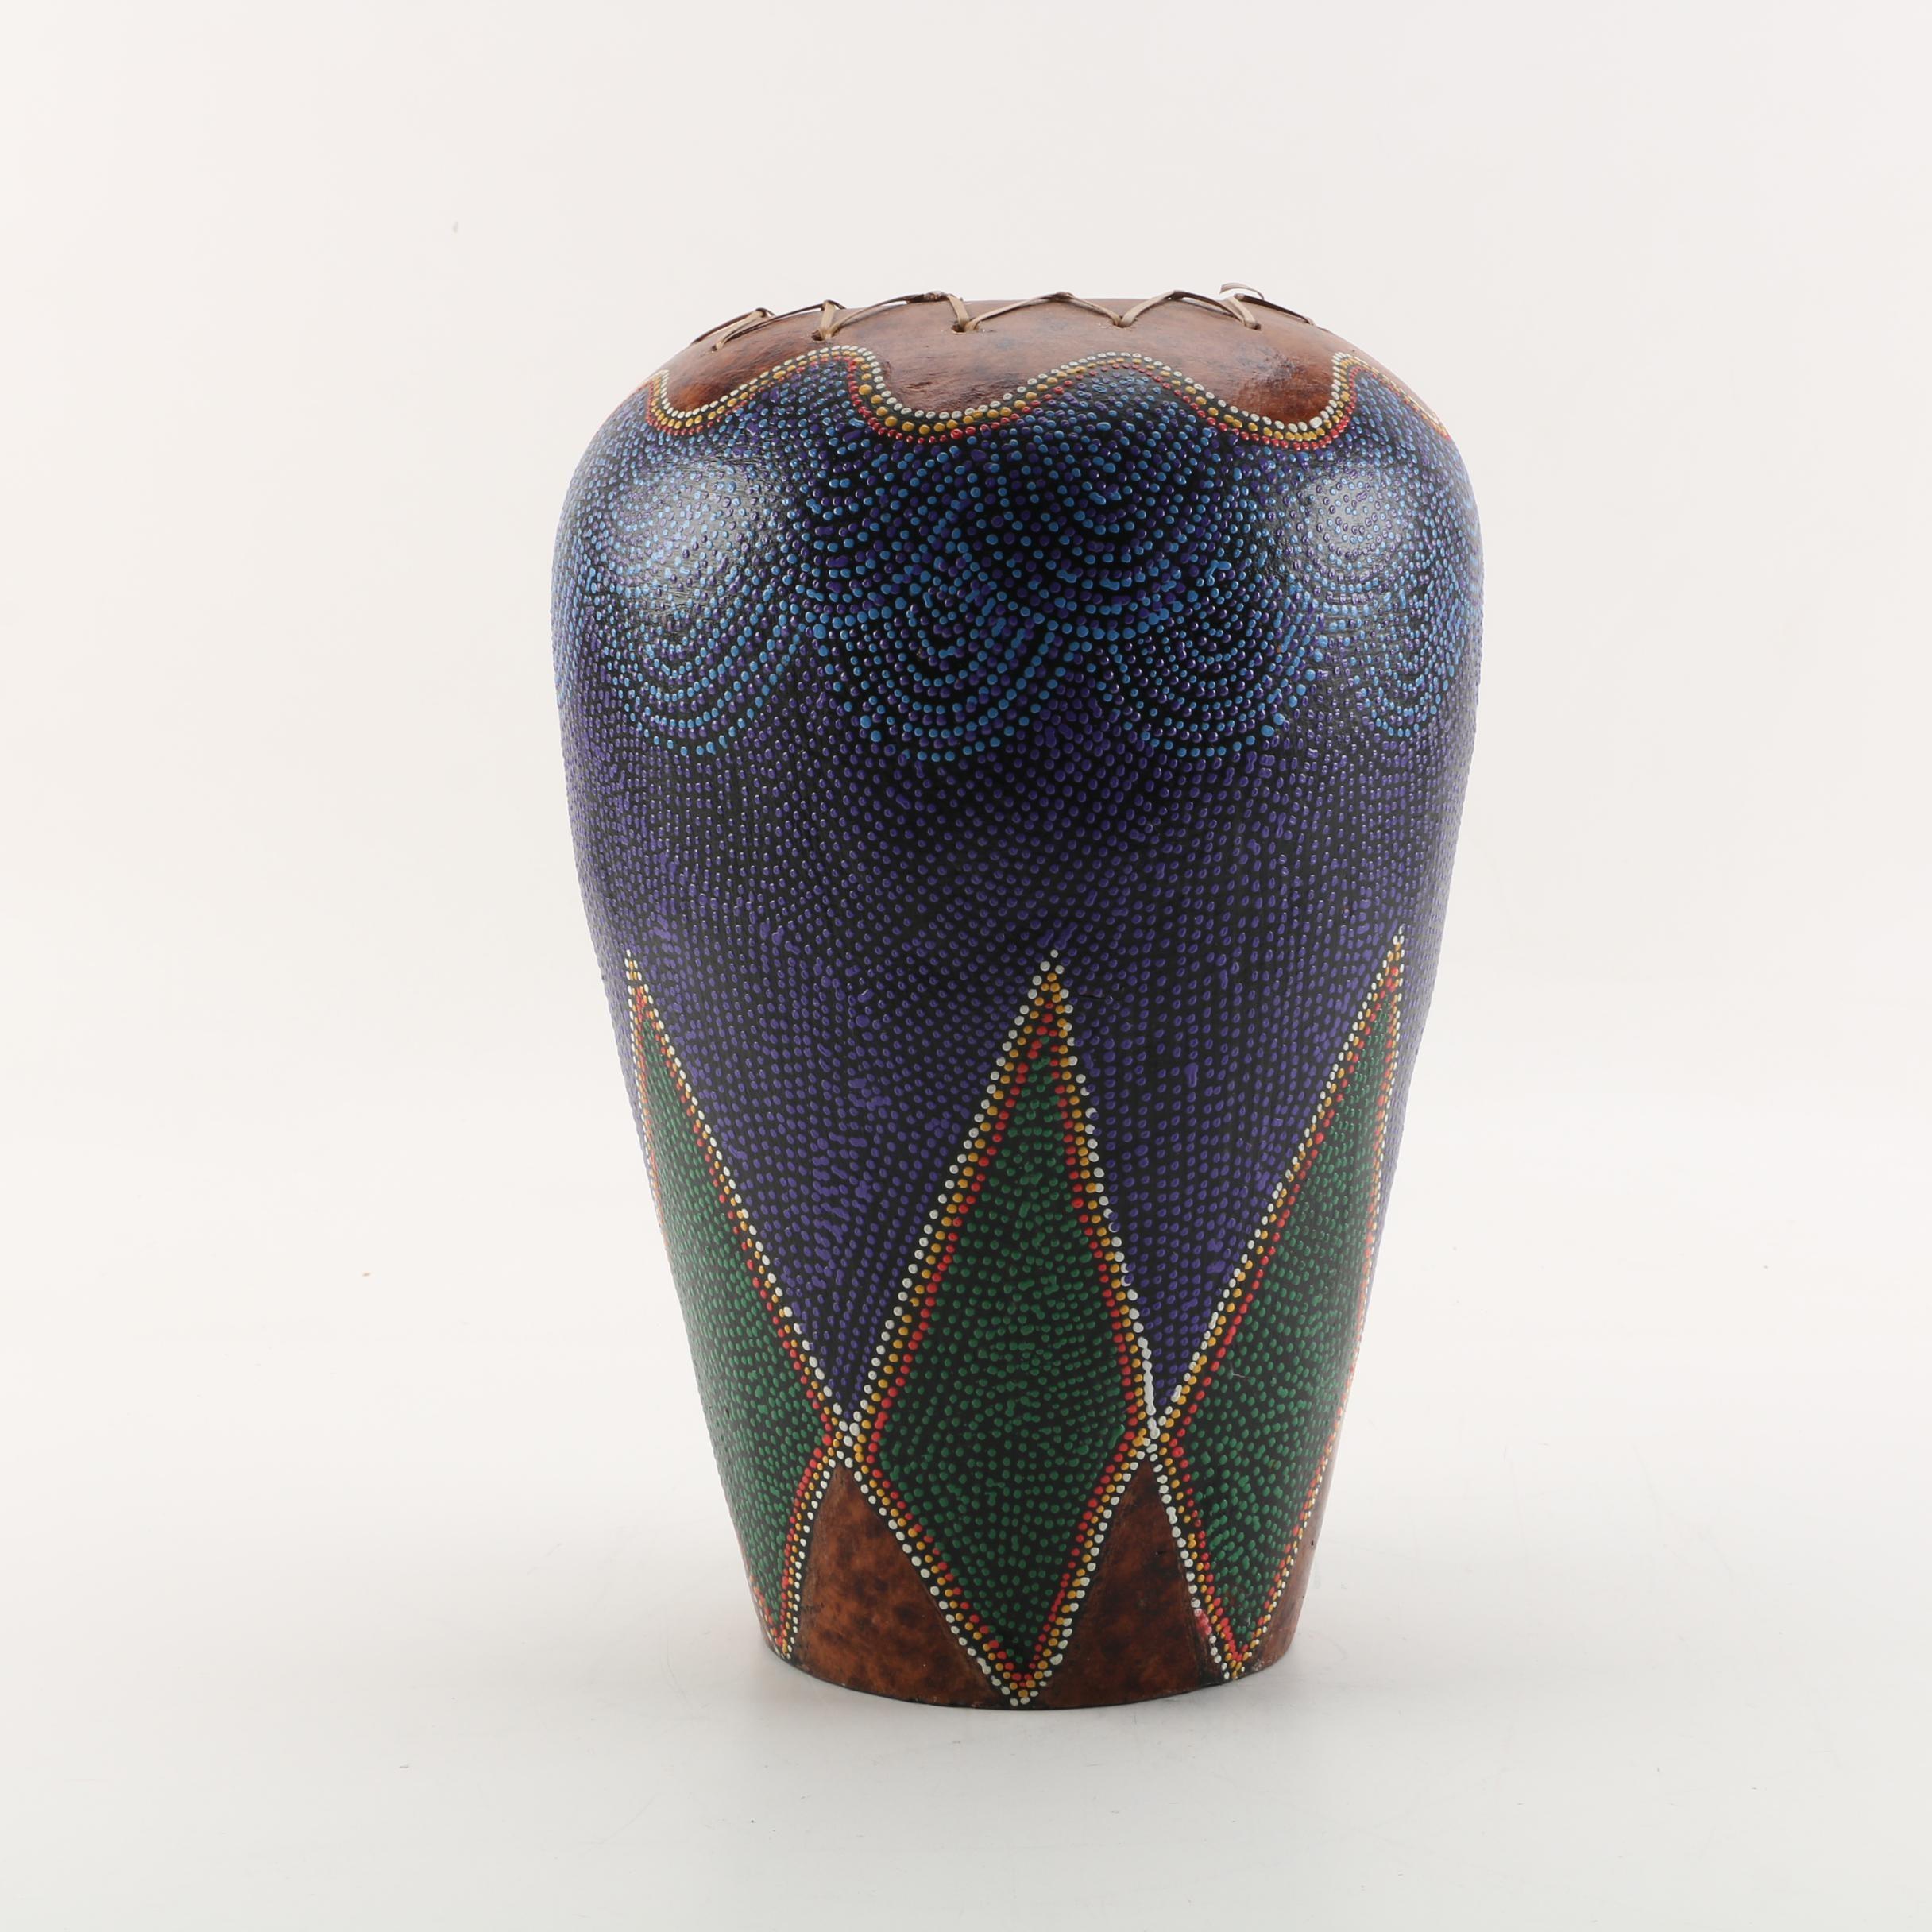 Tribal Inspired Pointillism Style Ceramic Vase